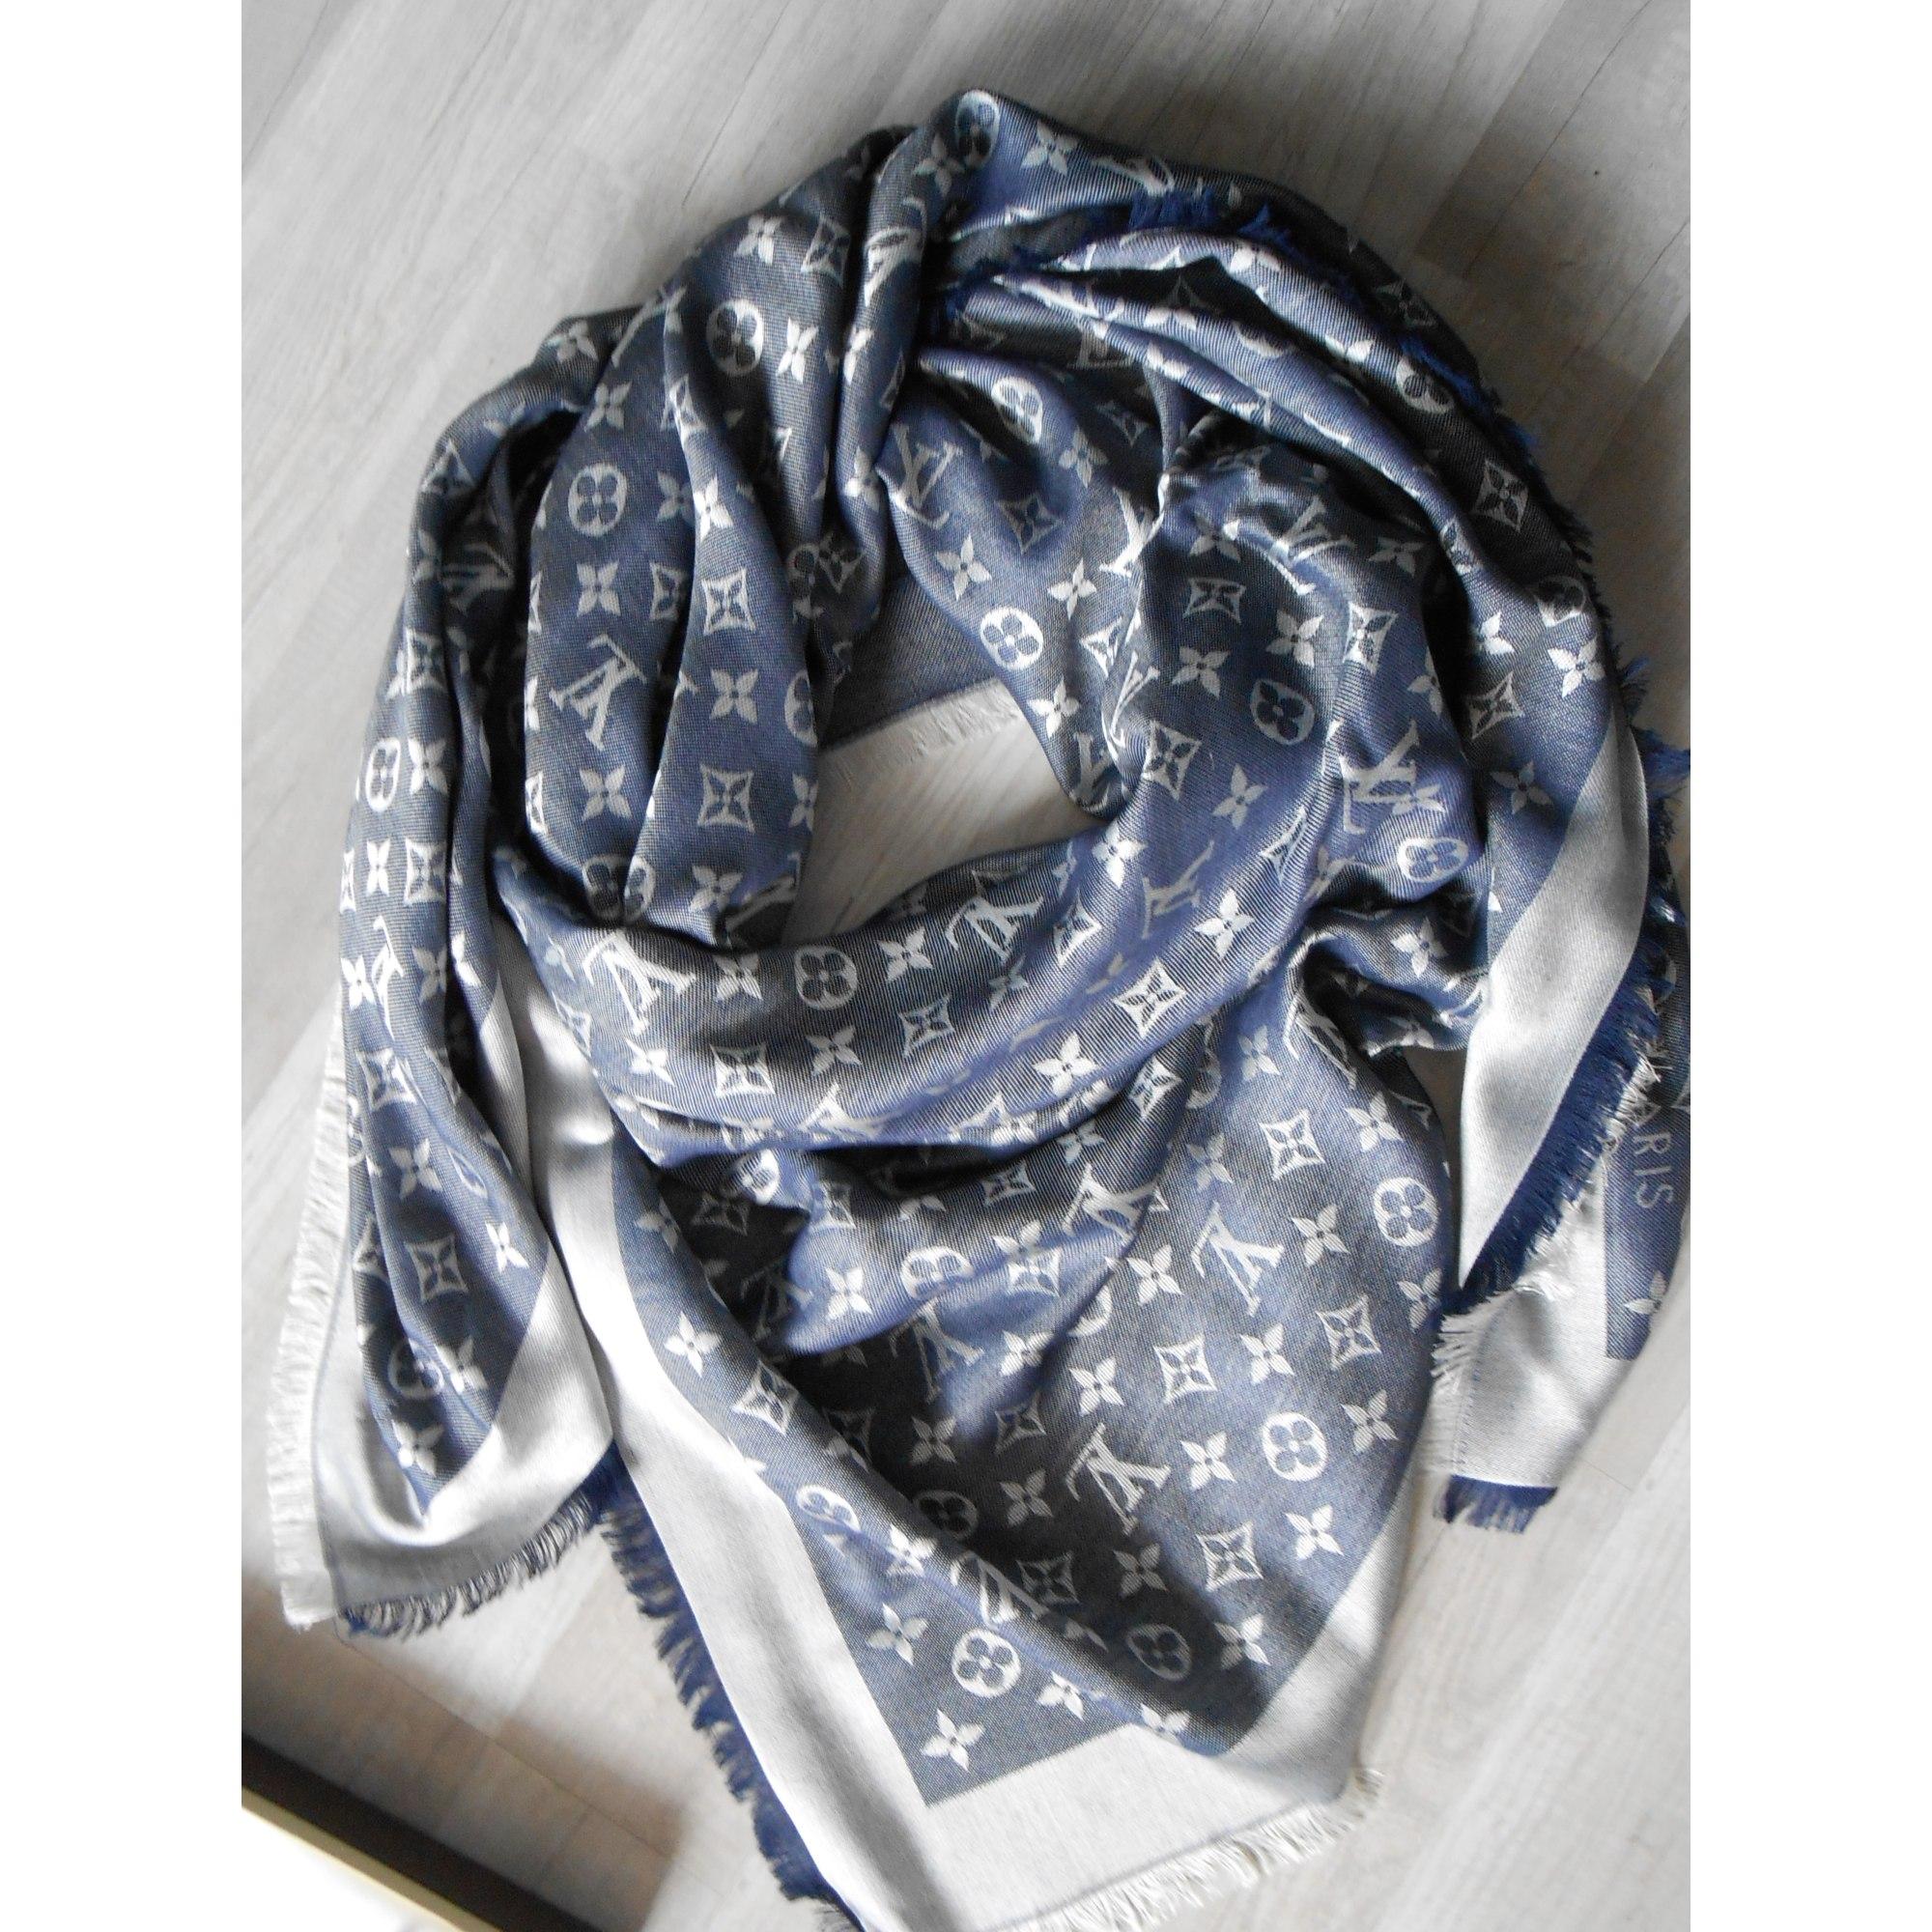 Châle LOUIS VUITTON Bleu, bleu marine, bleu turquoise c529ec65689